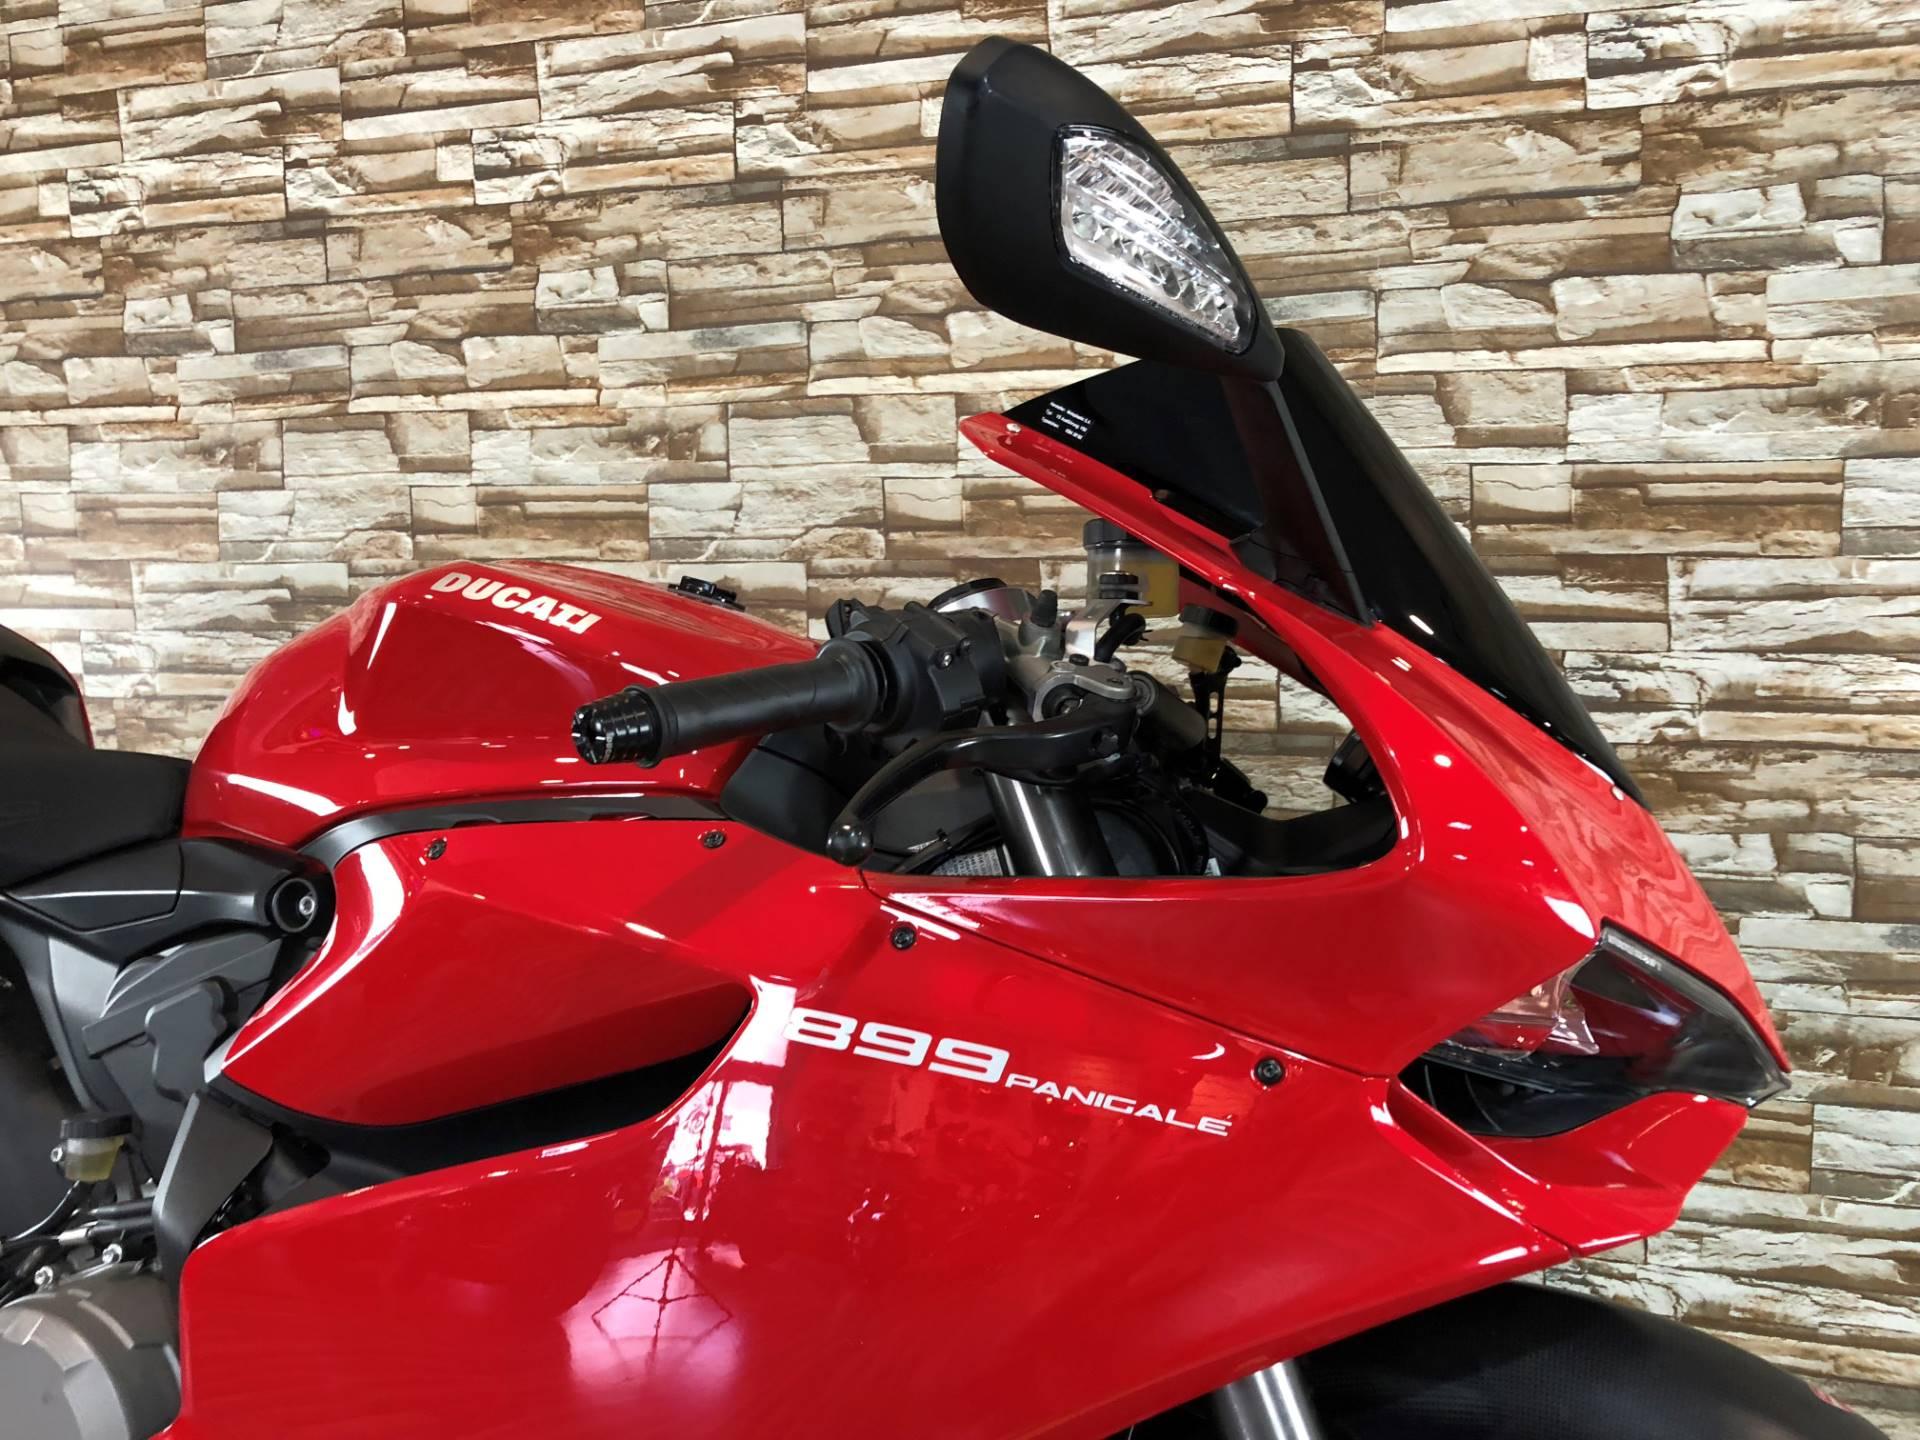 2014 Ducati Superbike 899 Panigale 9